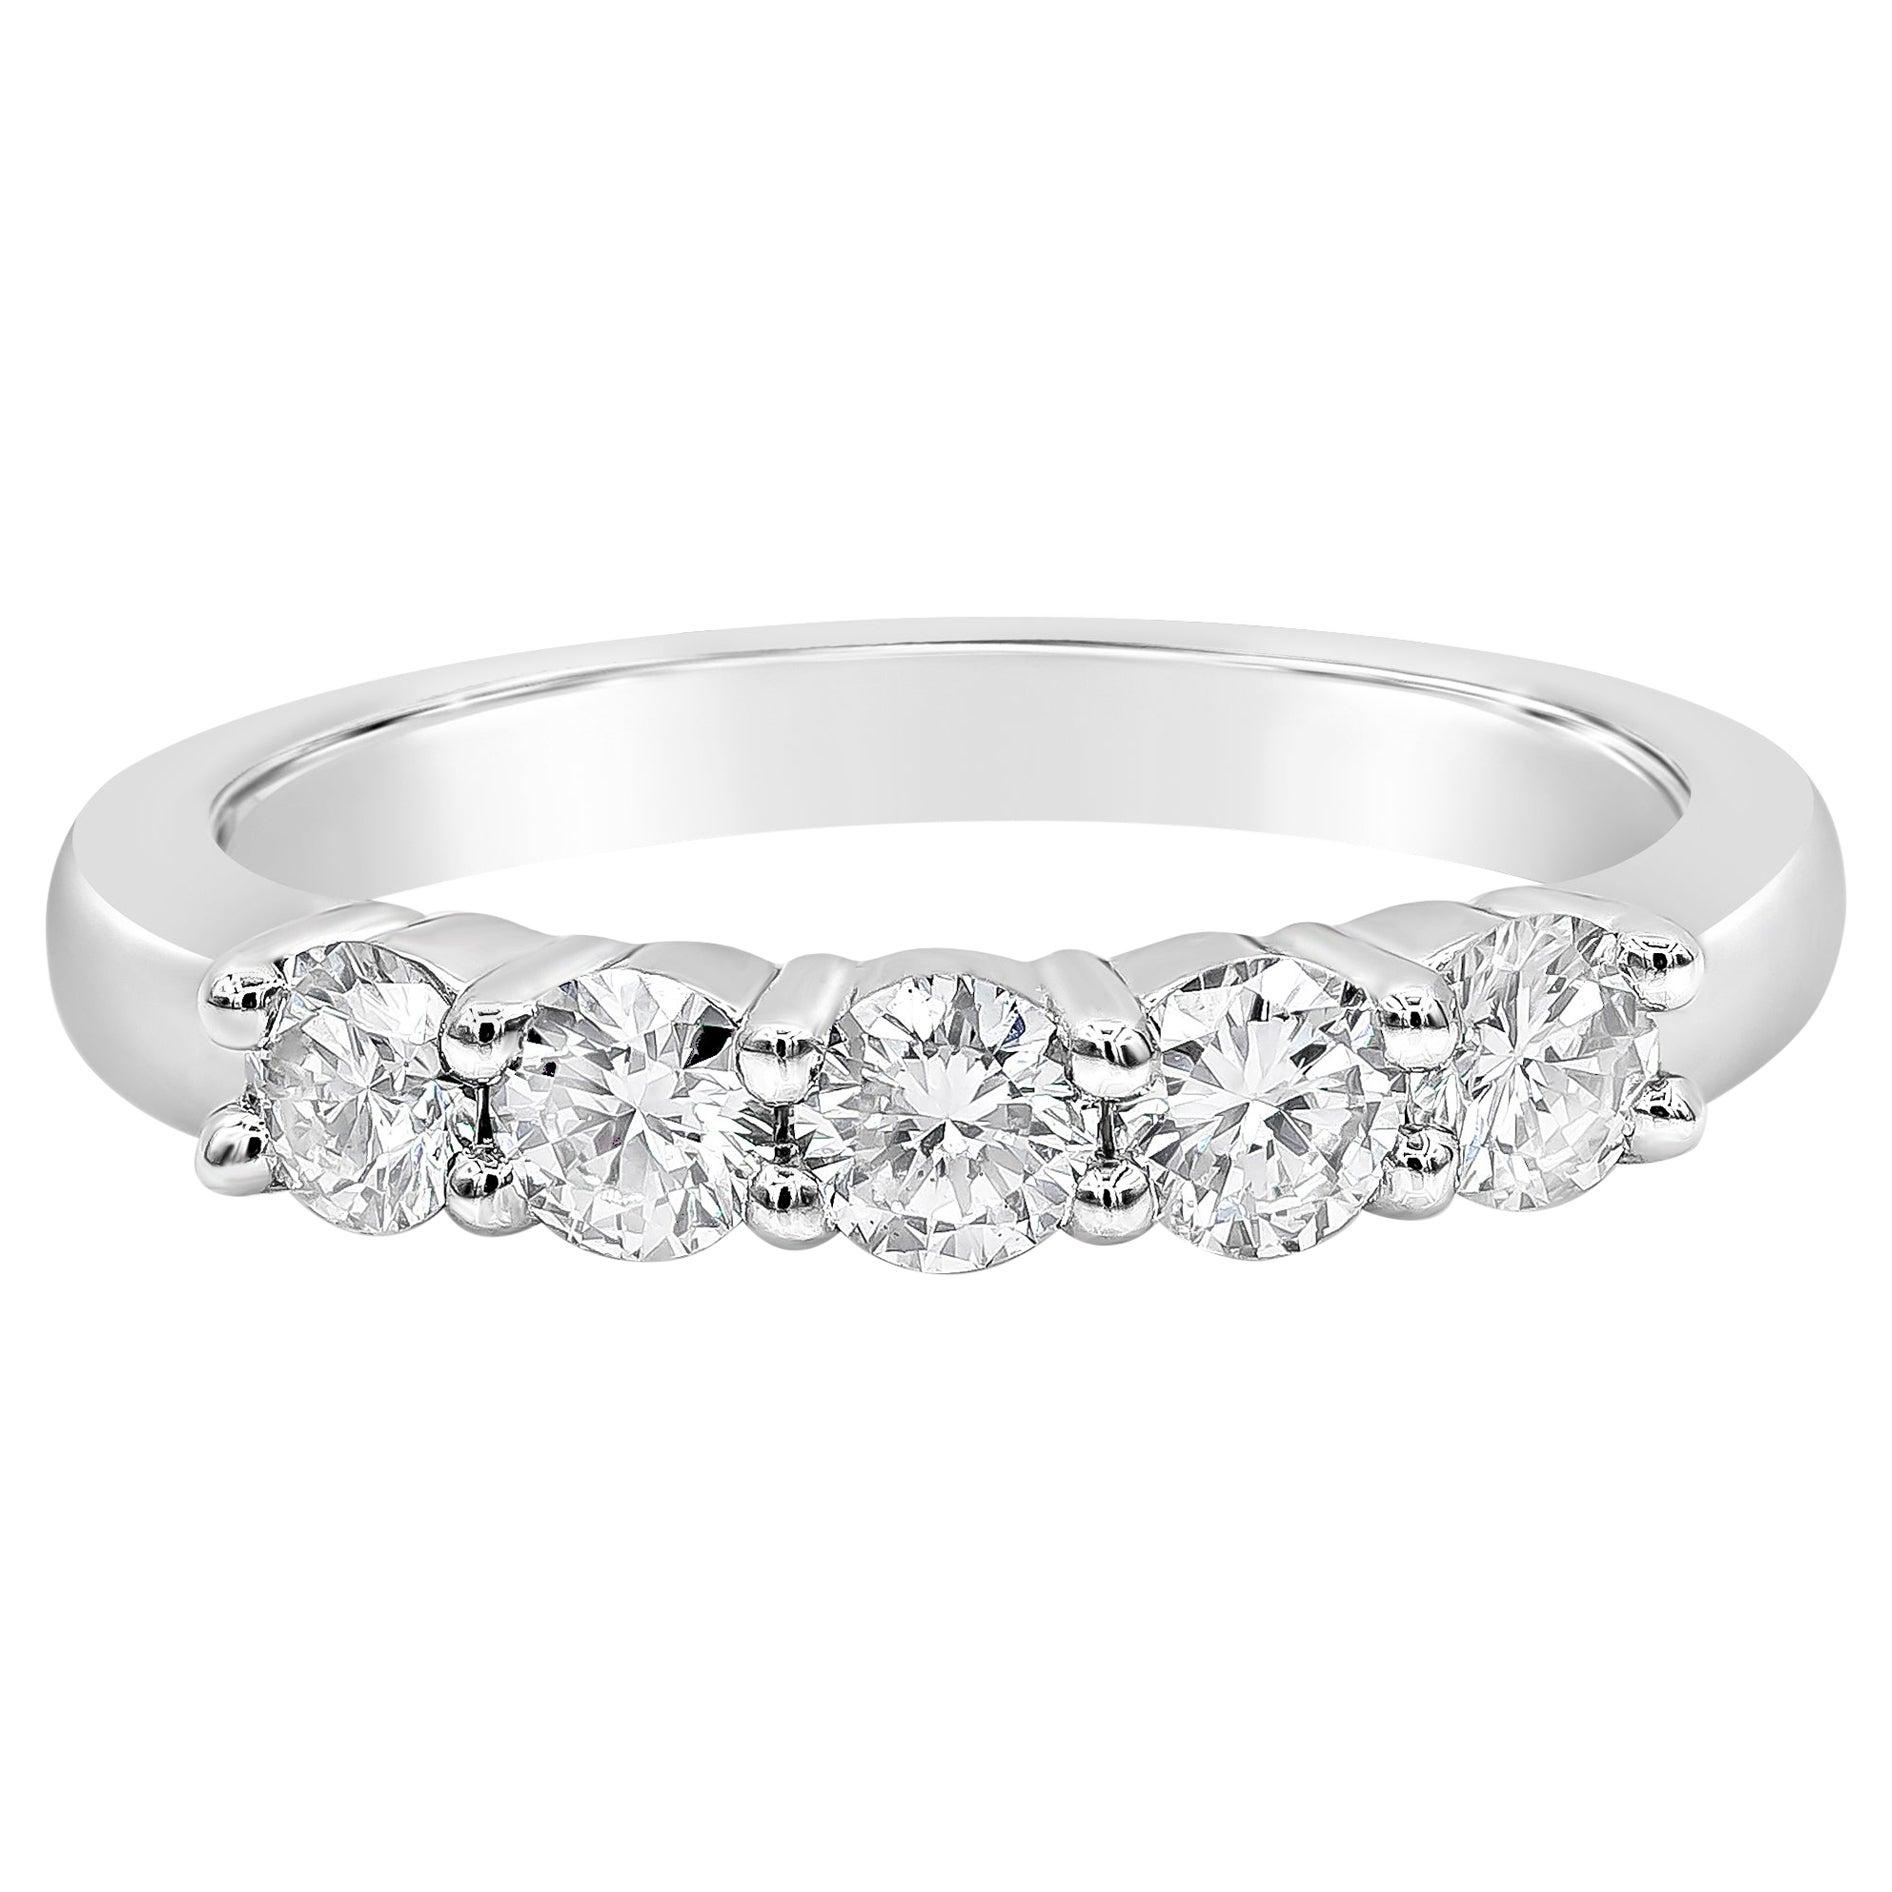 Roman Malakov 0.75 Carat Round Diamond Platinum Five-Stone Wedding Band